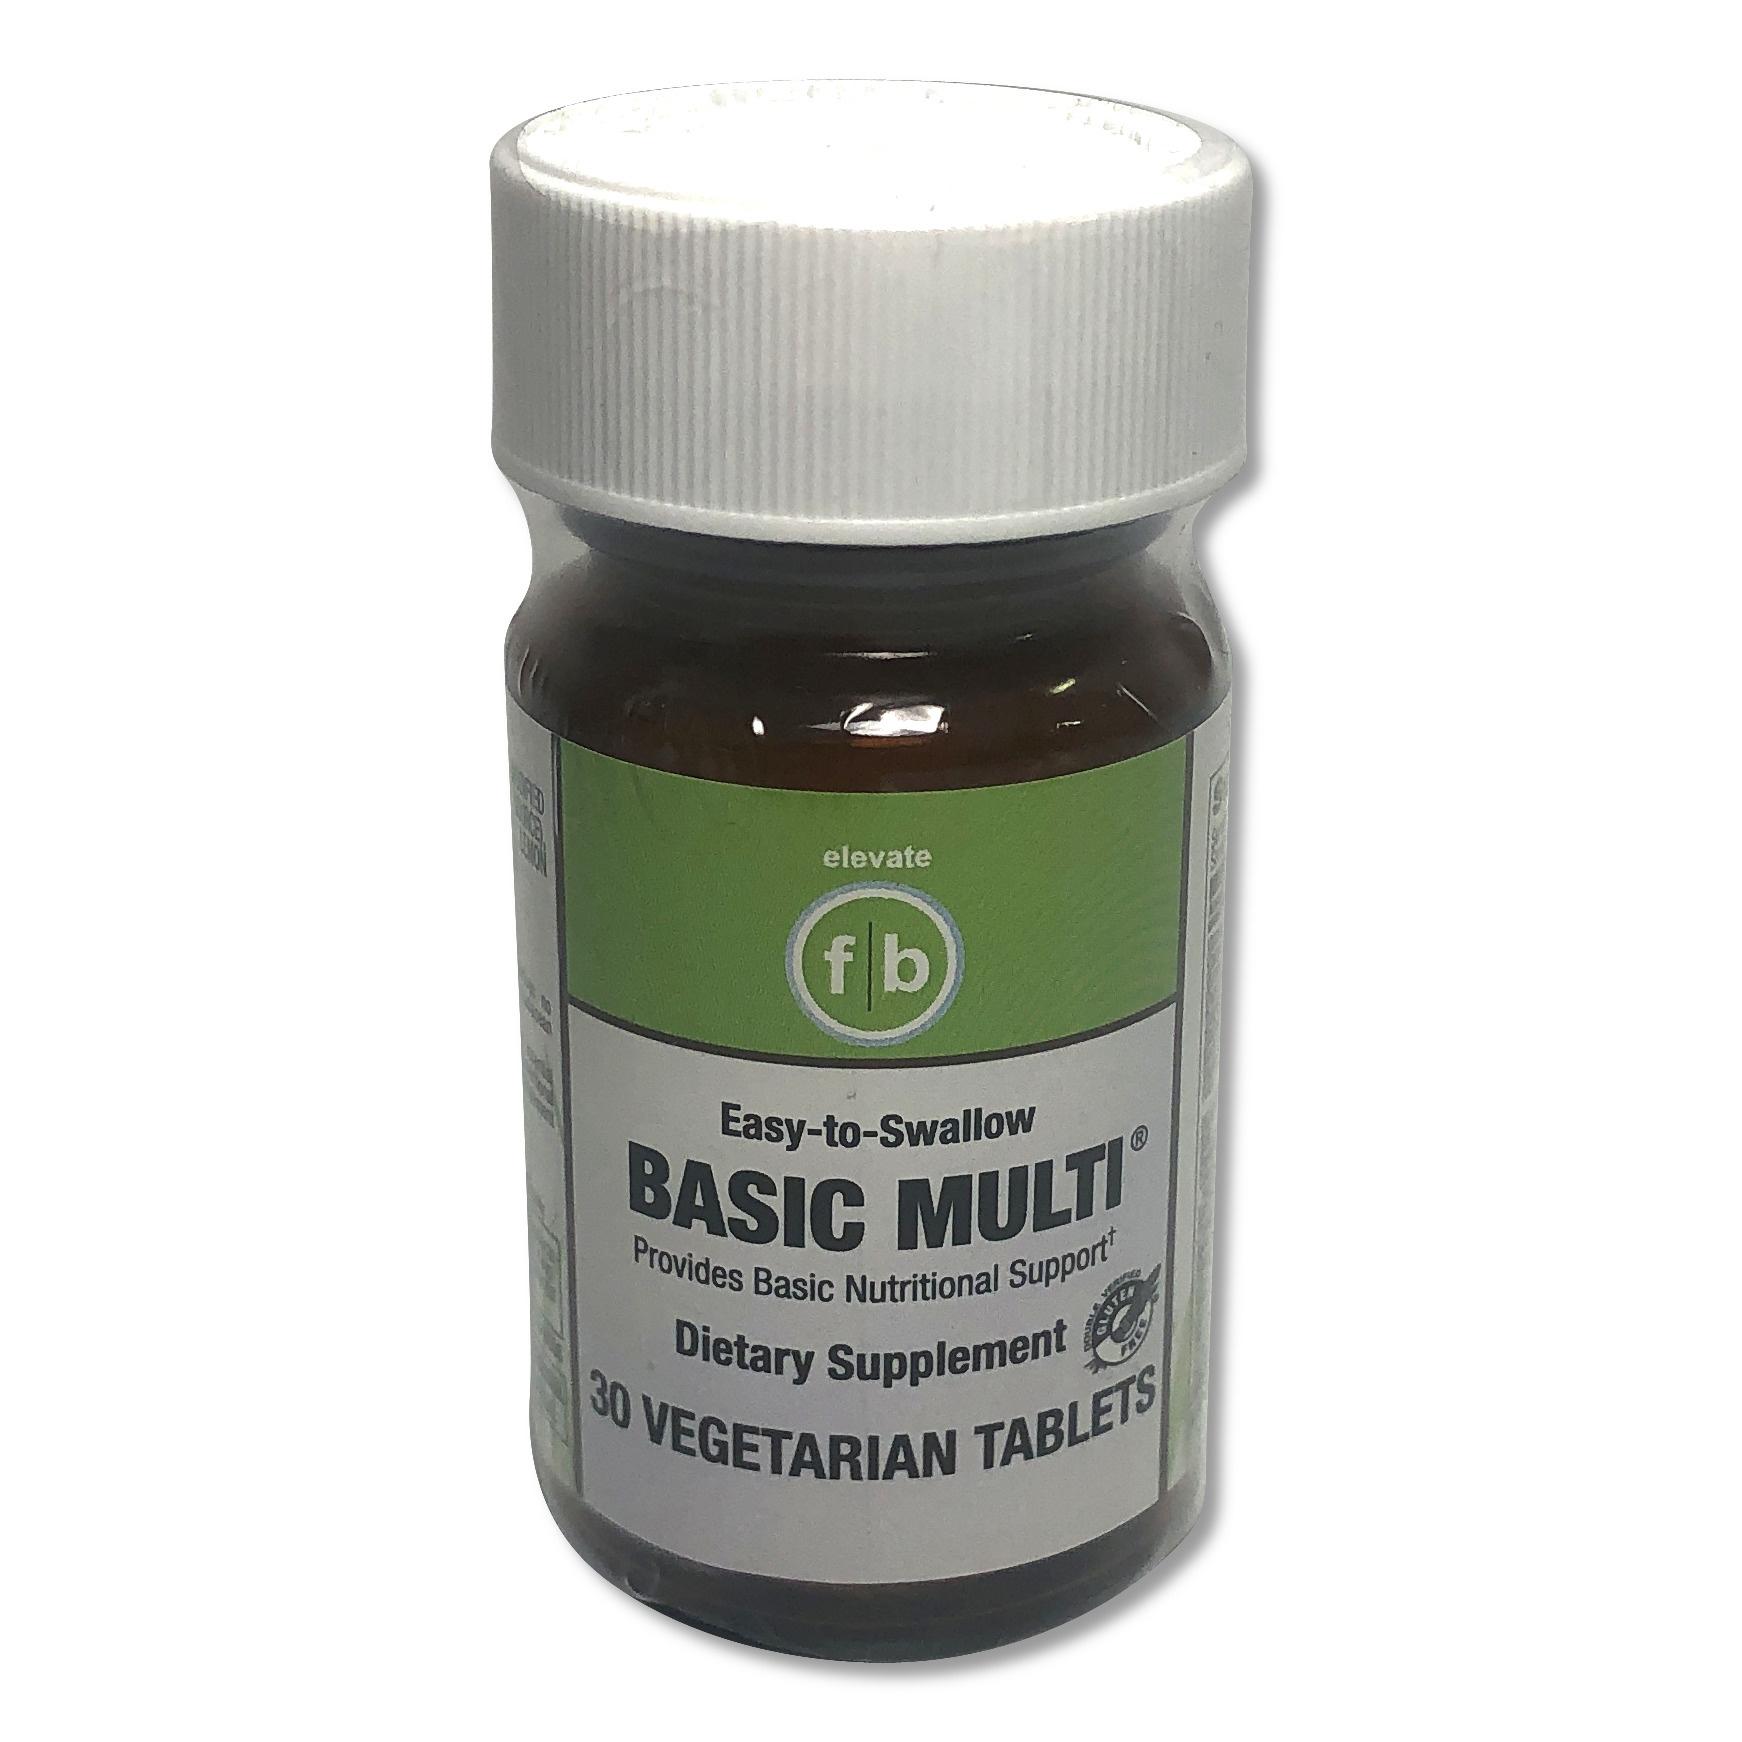 Basic Multi-1